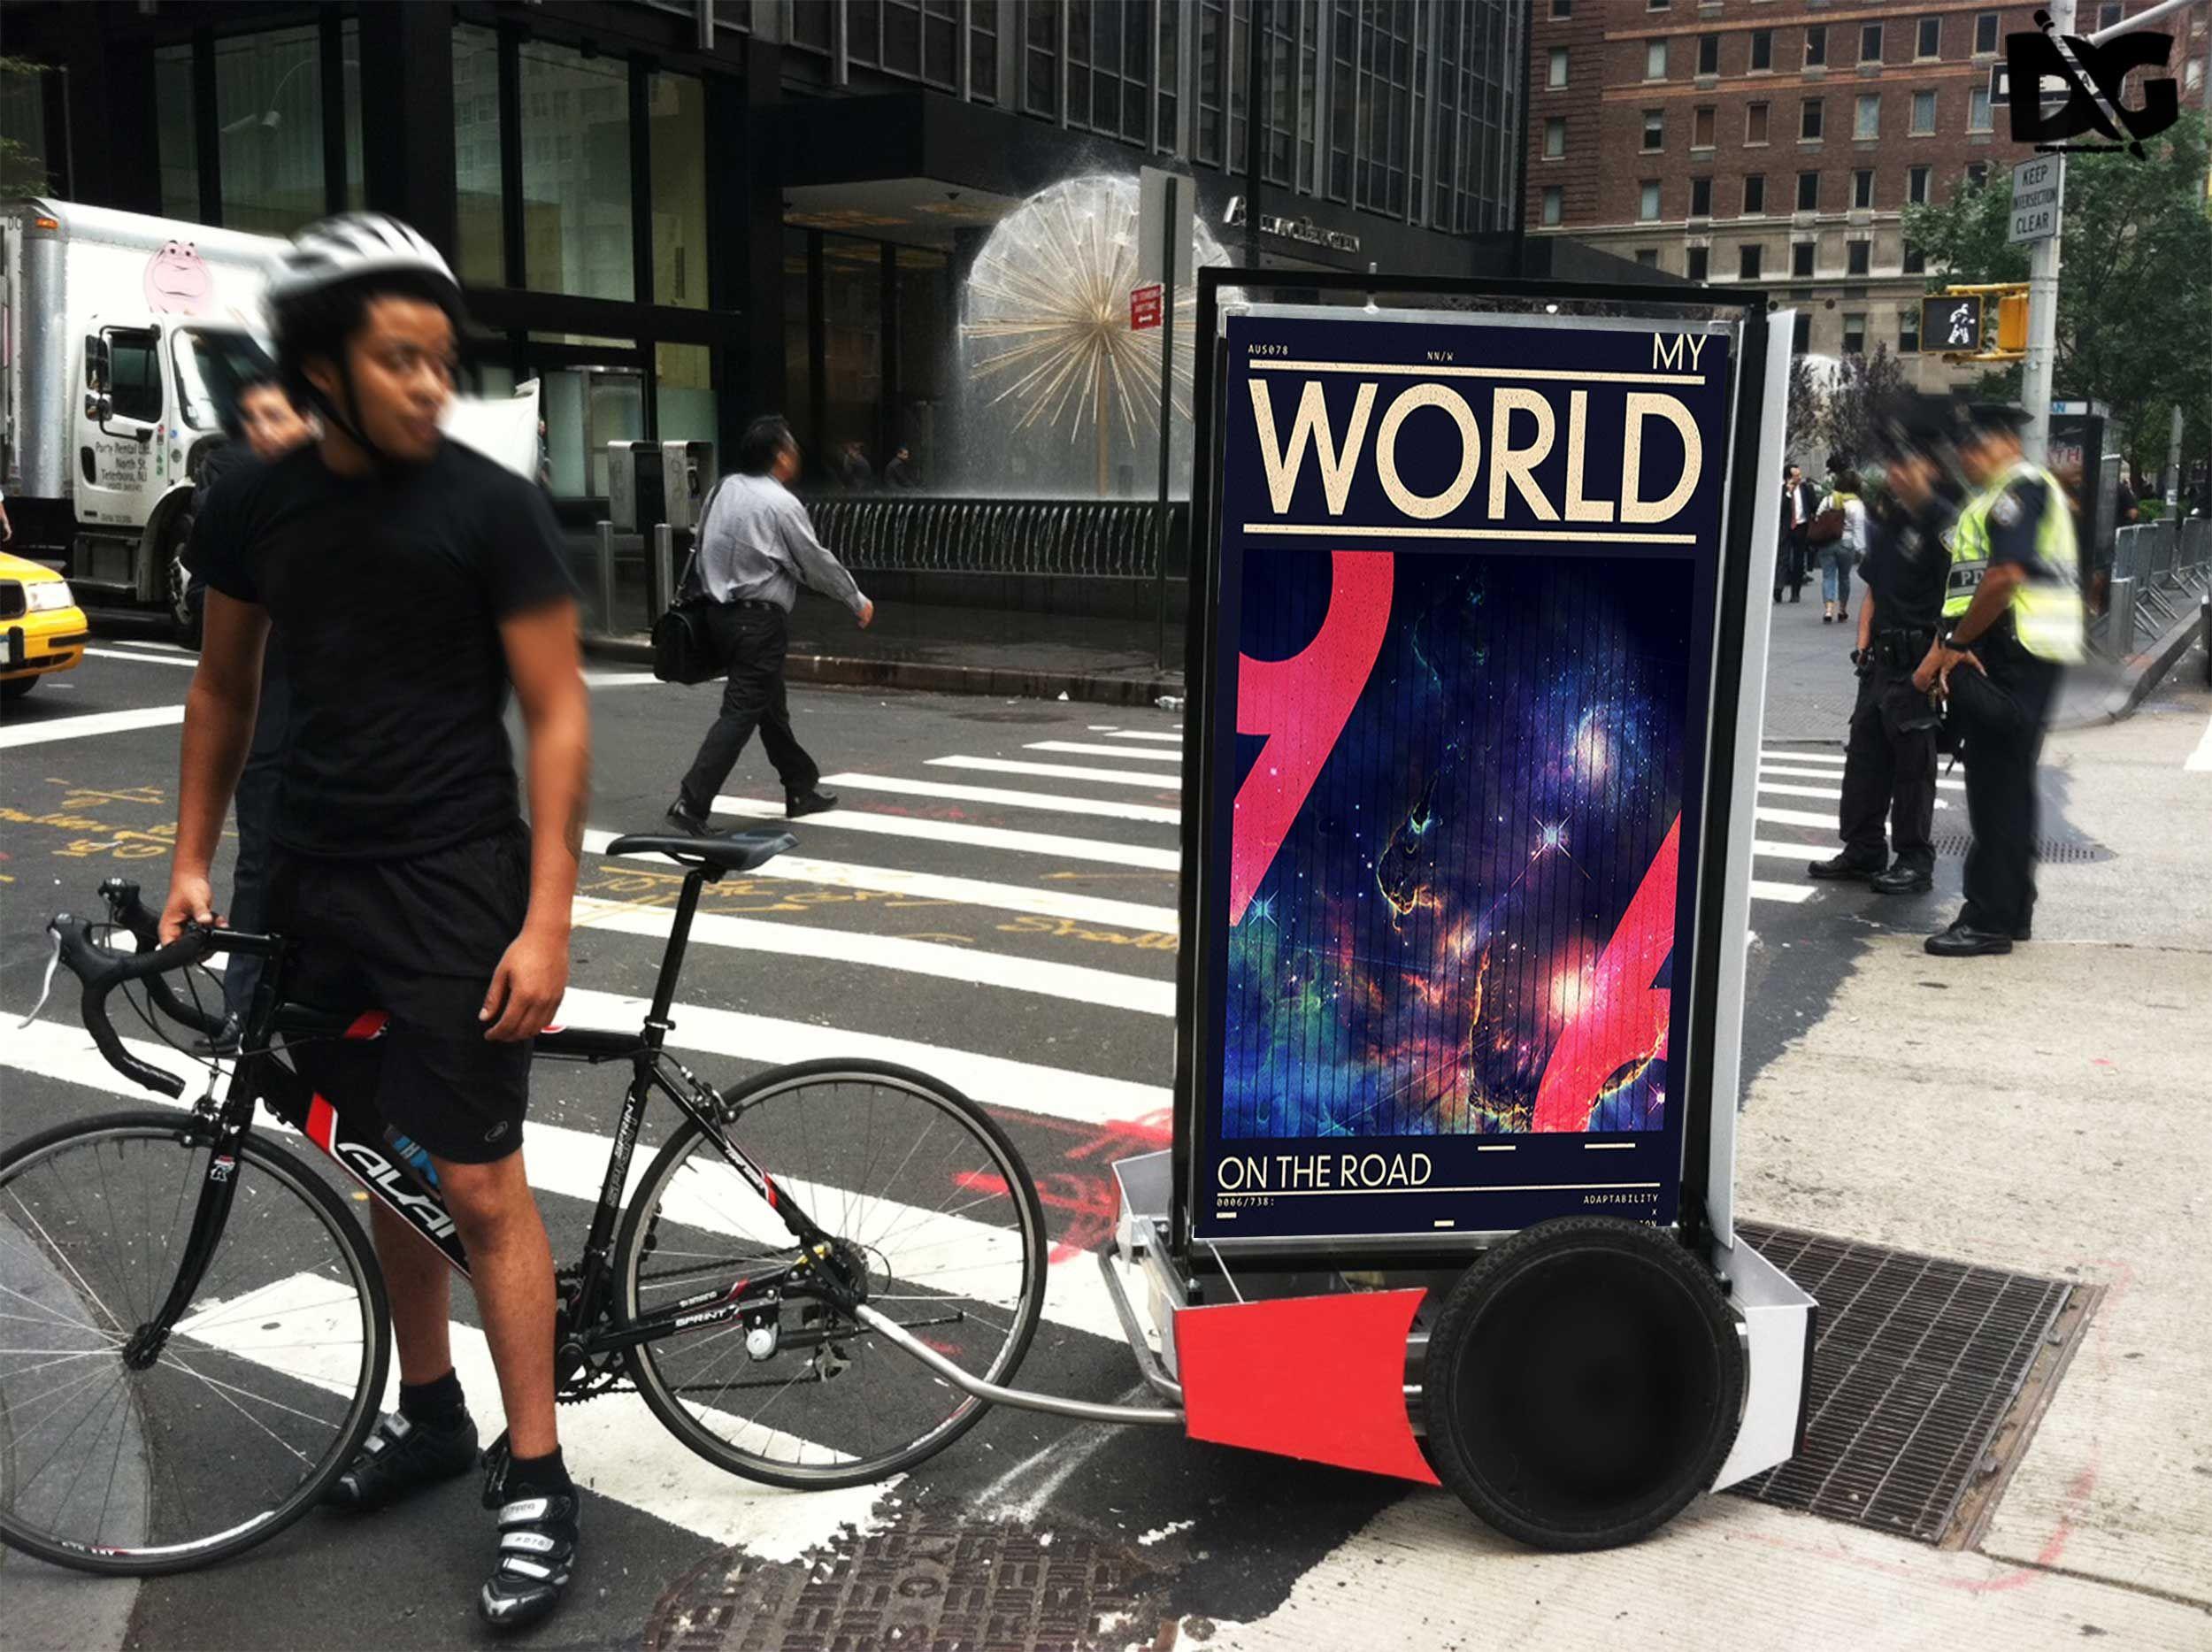 Download Free Download Psd Bicycle Billboard Ad Mockup Admockup Billboardadmockup Billboardmockup Branding Download Downloadpsd Free Mockup Free Psd Mockup Psd